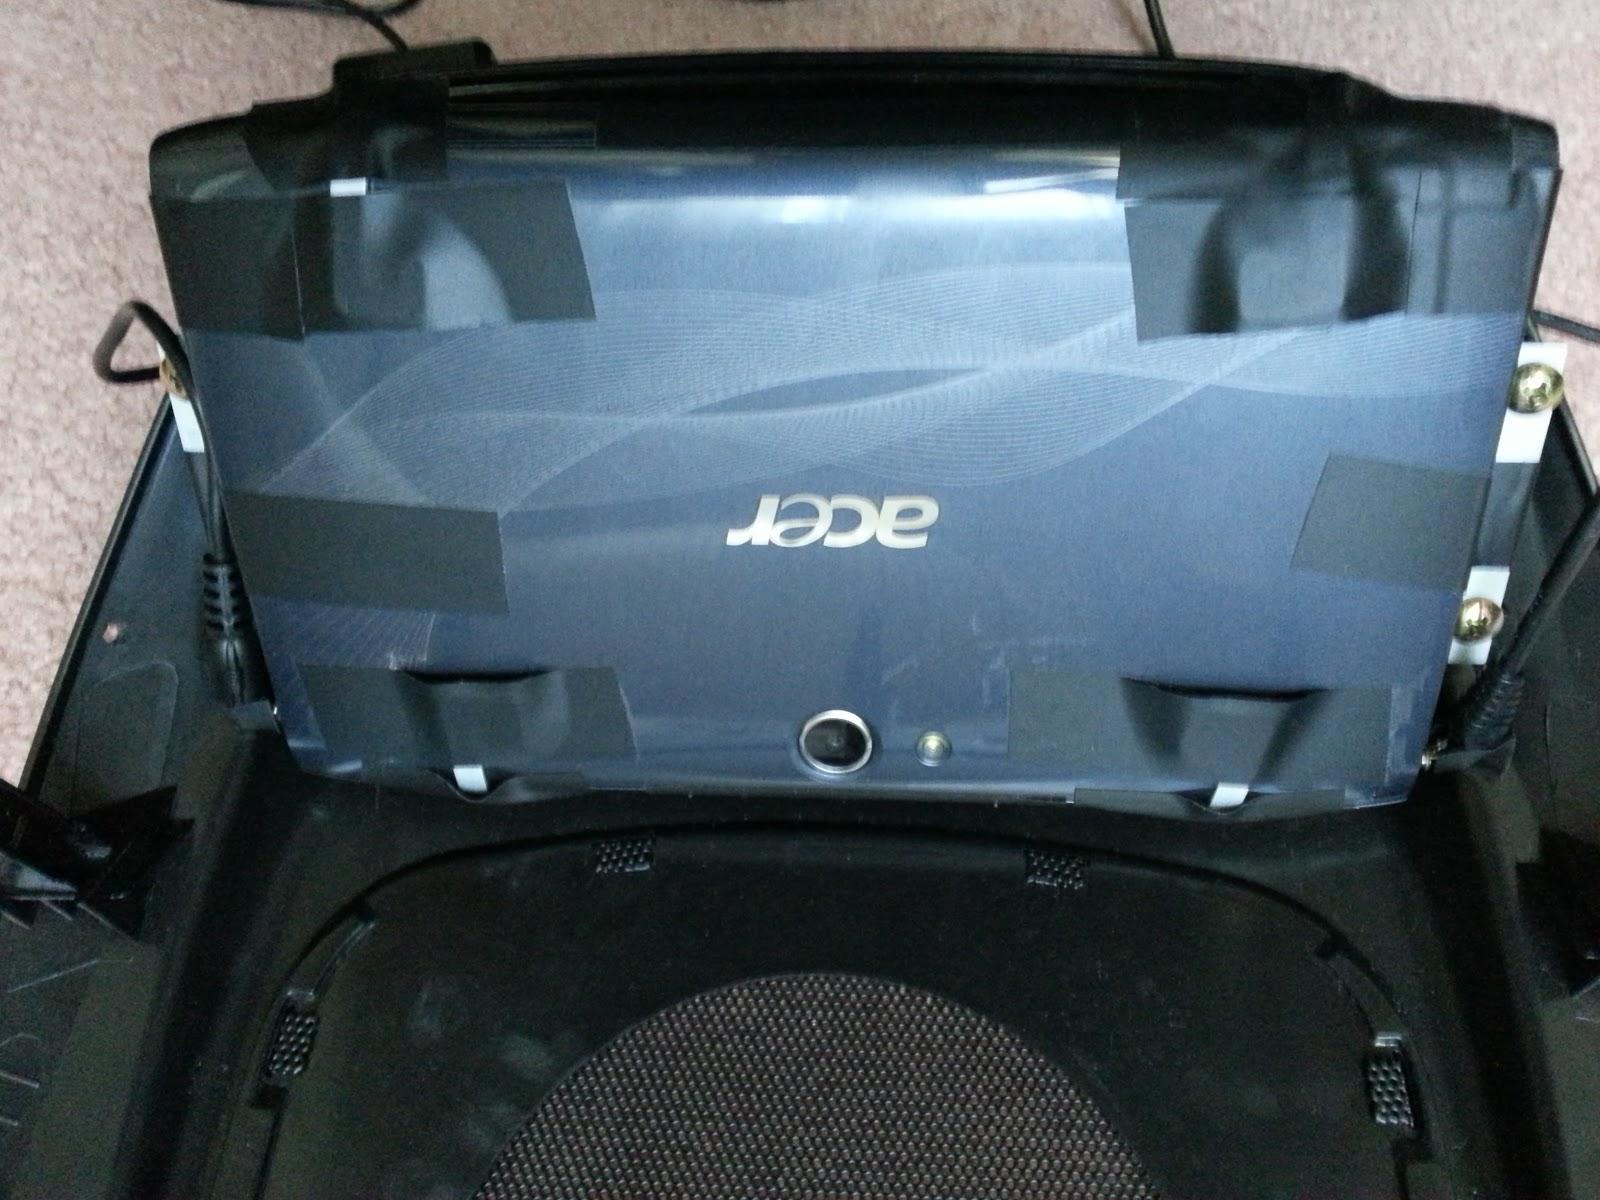 Dereks projects diy installing a tablet in a hyundai genesis coupe keyboard keysfo Choice Image